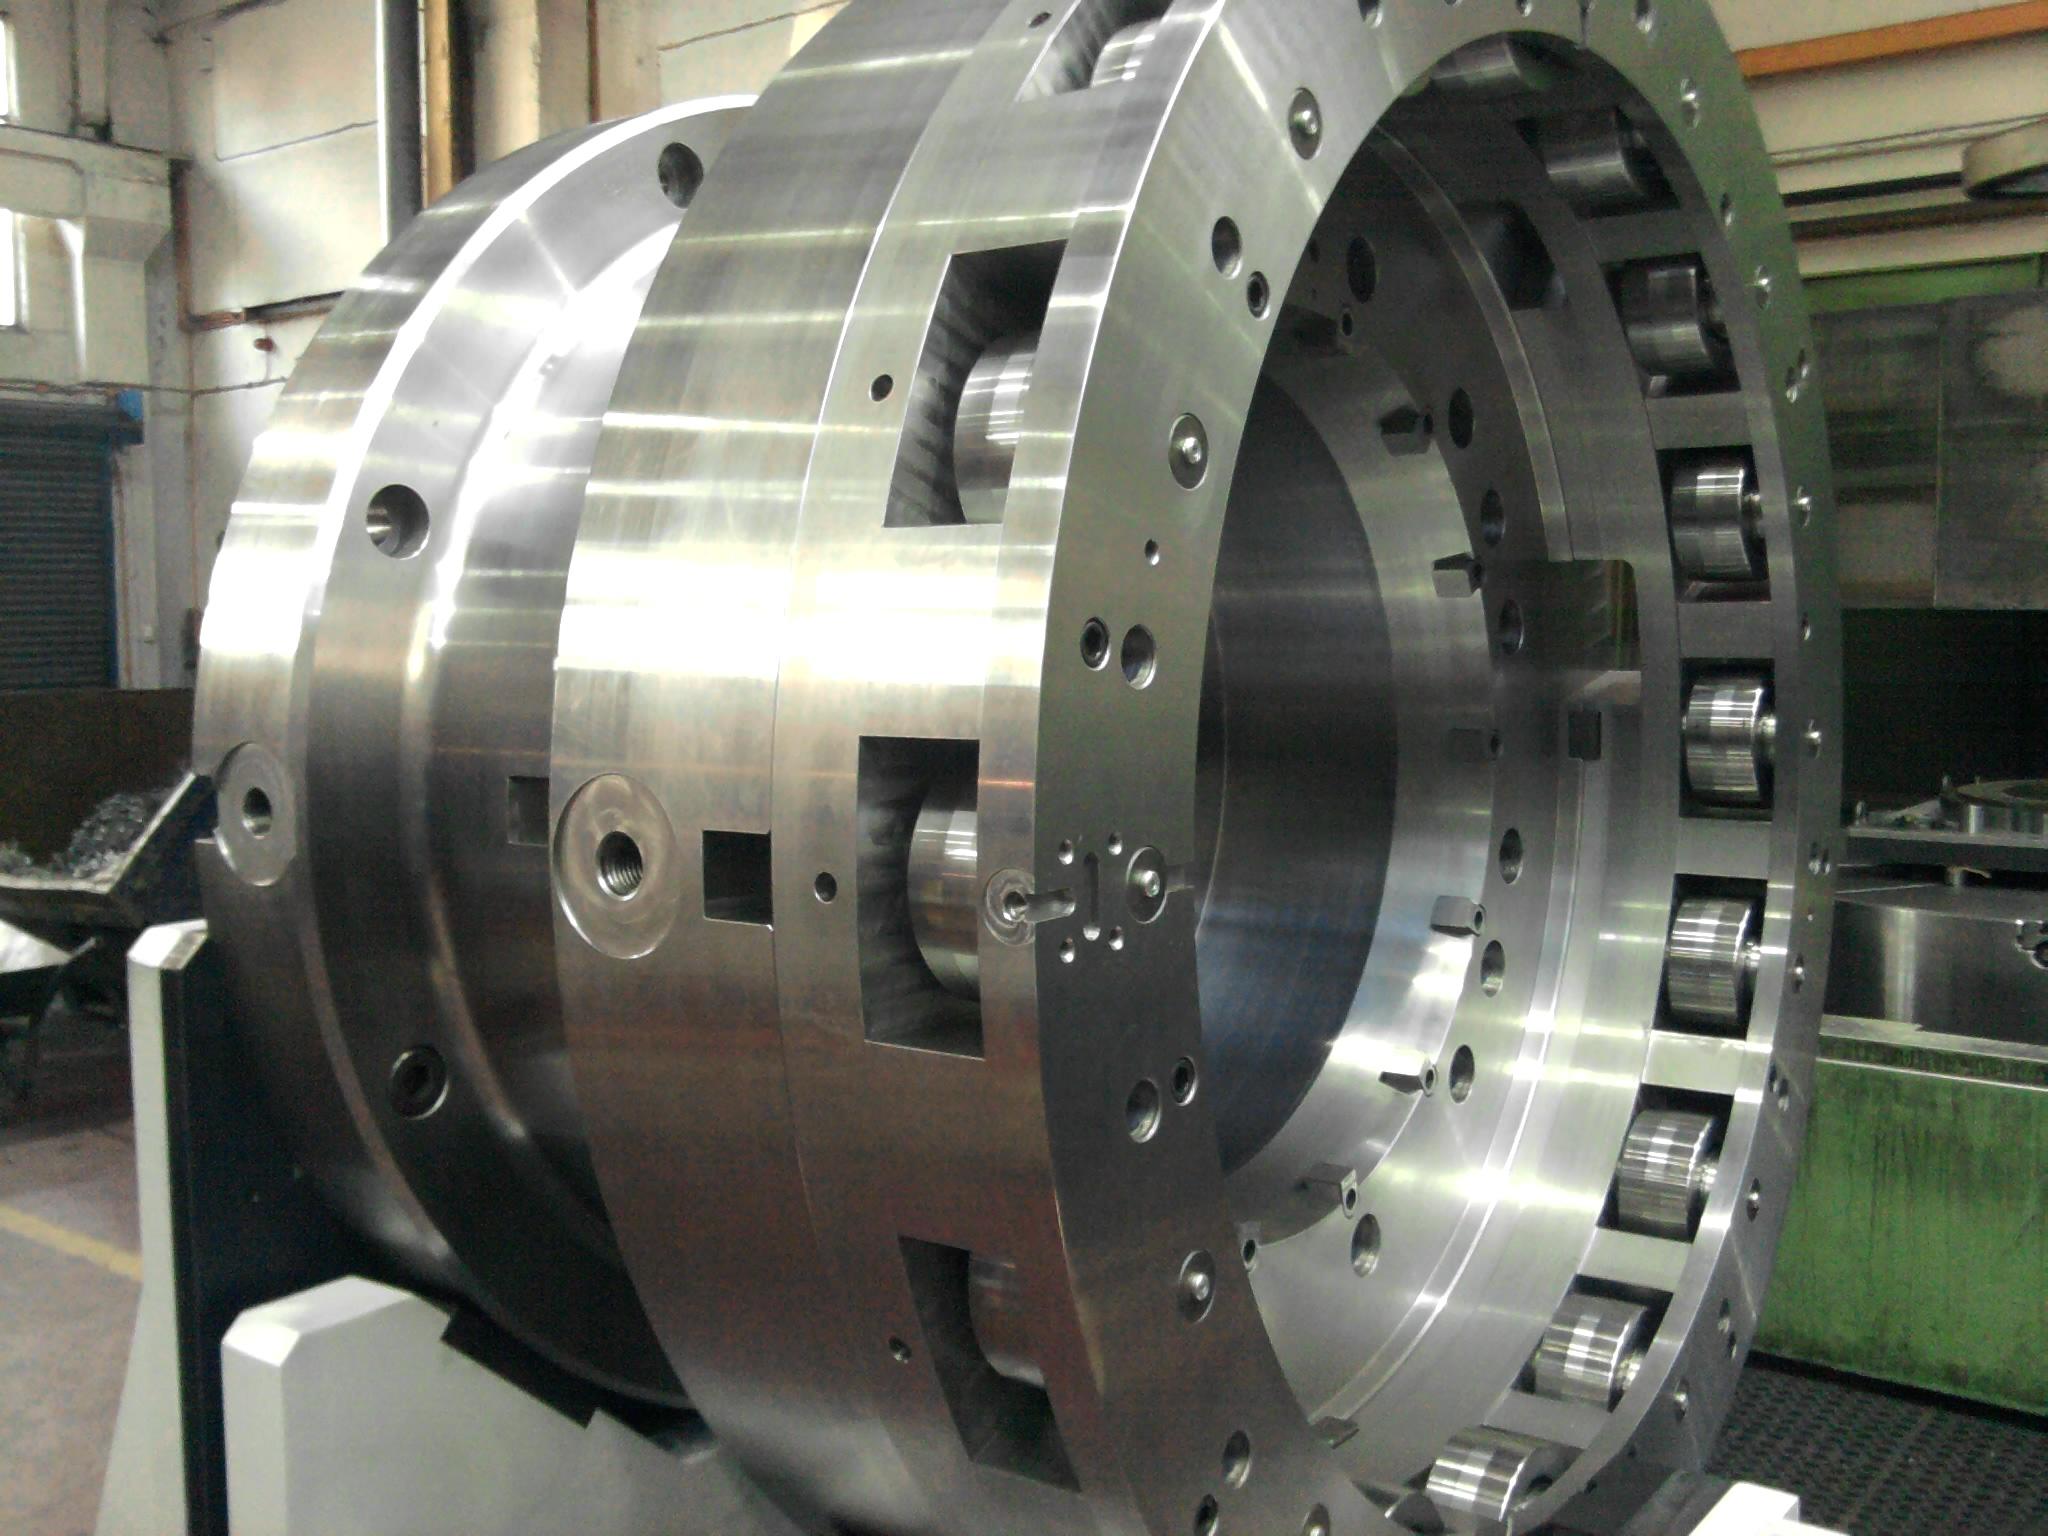 Larkshill Engineering Precision Engineering United Kingdom